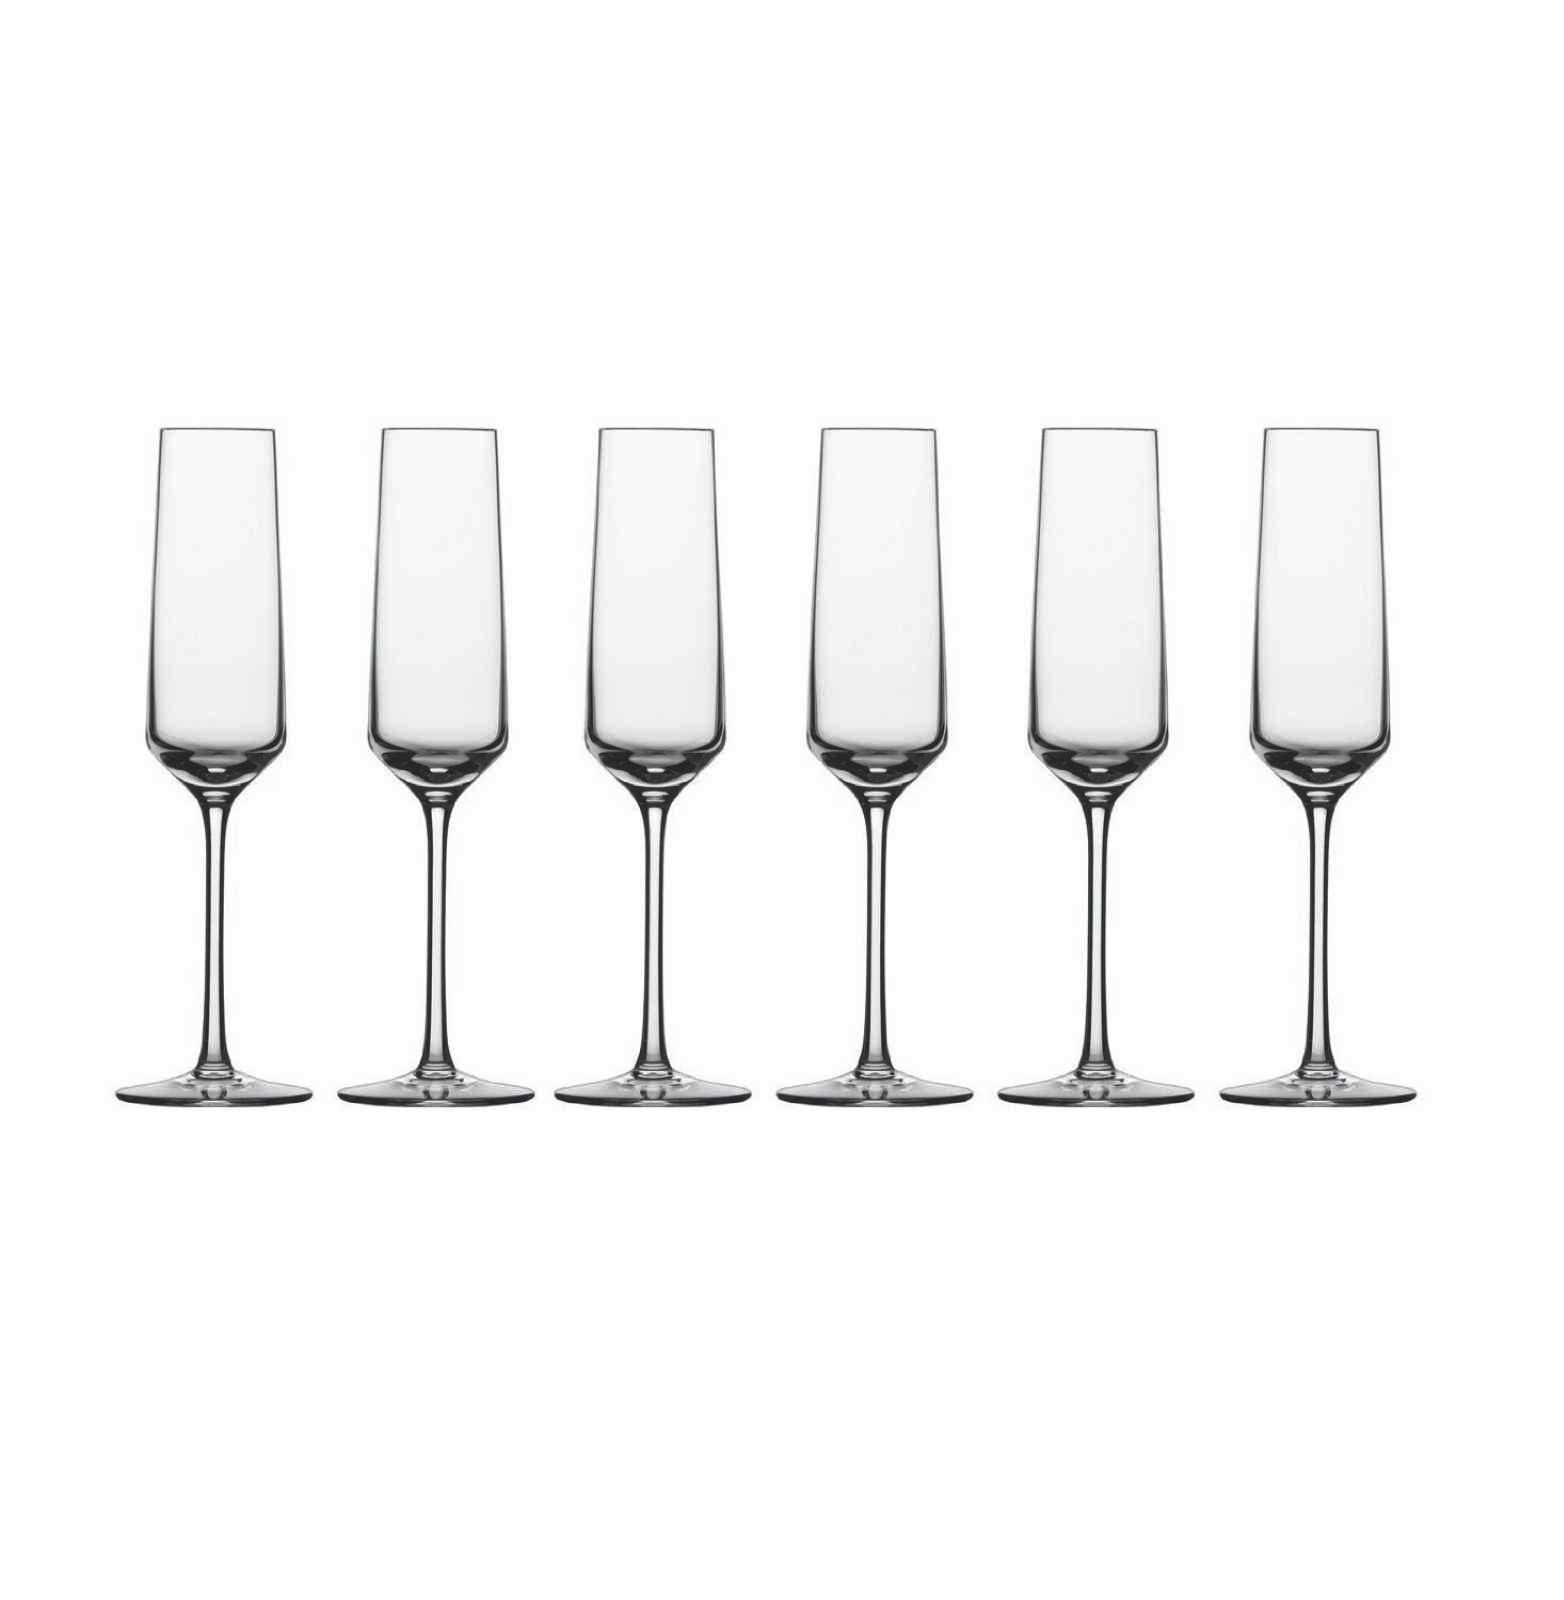 Онлайн каталог PROMENU: Набор бокалов для шампанского Schott Zwiesel PURE, объем 0,209 л, прозрачный, 6 штук Schott Zwiesel 112415_6шт